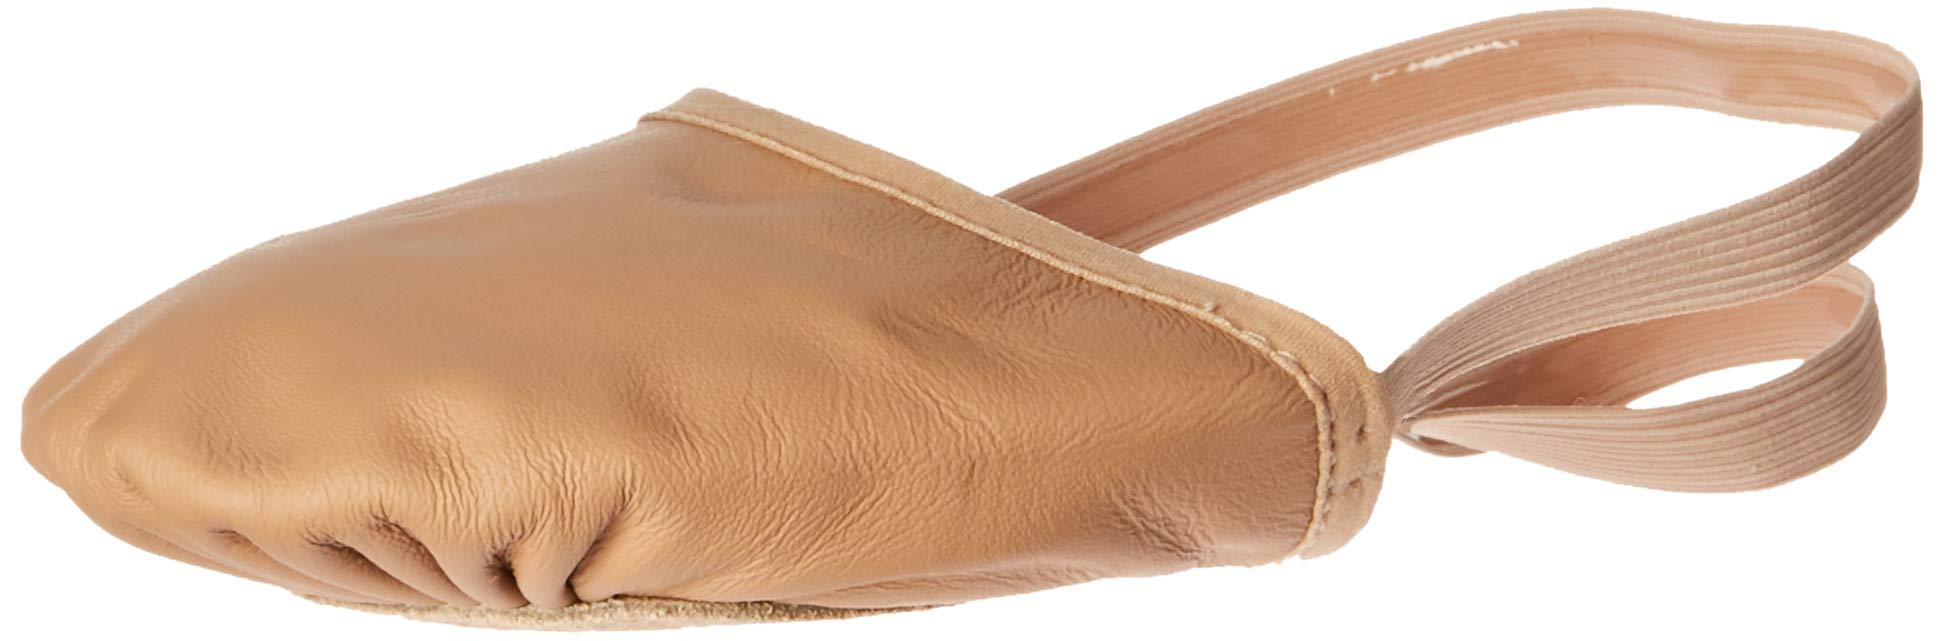 Bloch Dance Womens Eclipse Leather Contemporary Lyrical Ballet Shoe